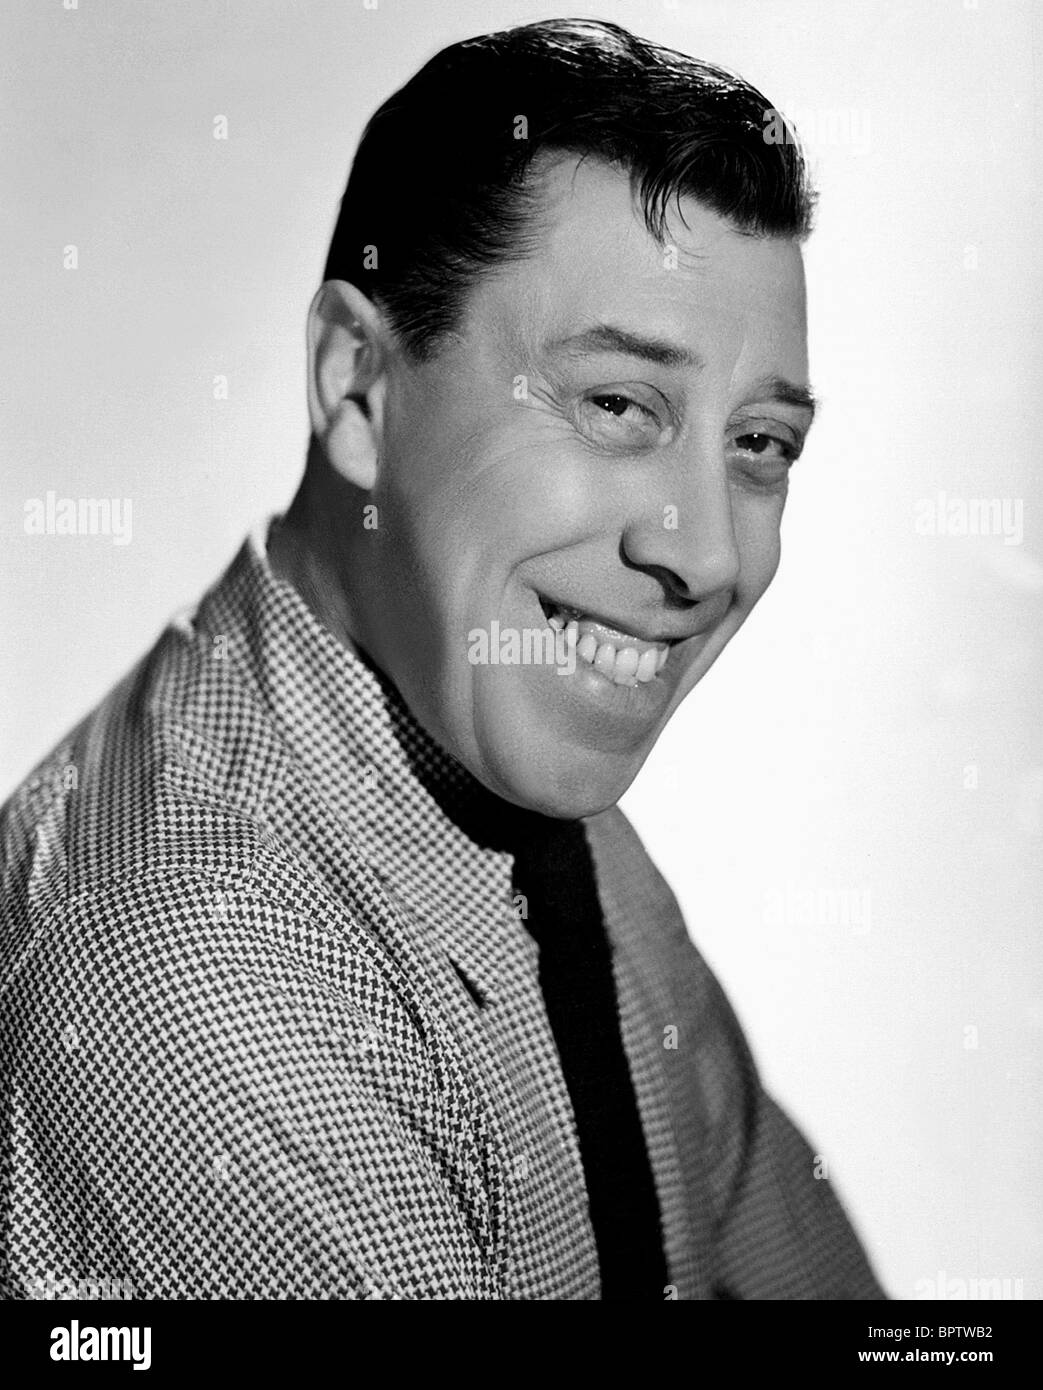 SCHAUSPIELER FERNANDEL (1955) Stockbild